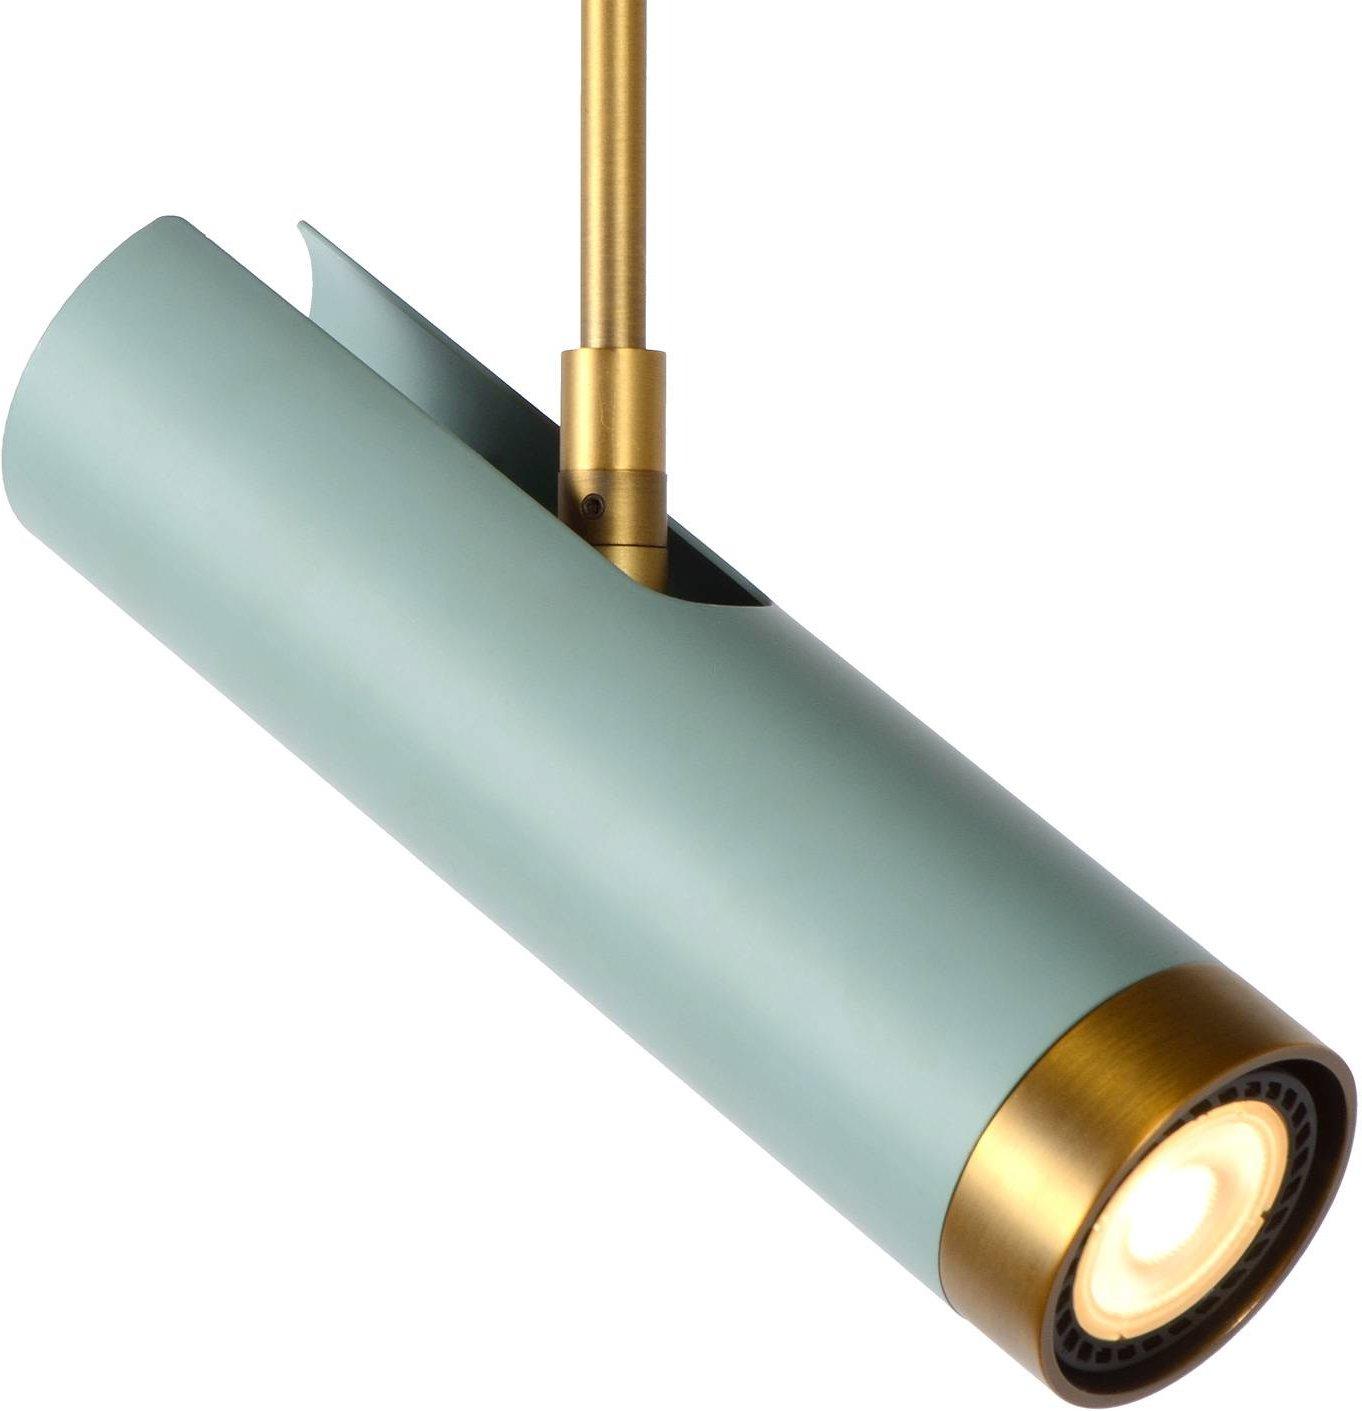 Selin hanging light rotatable tiltable  turquoise